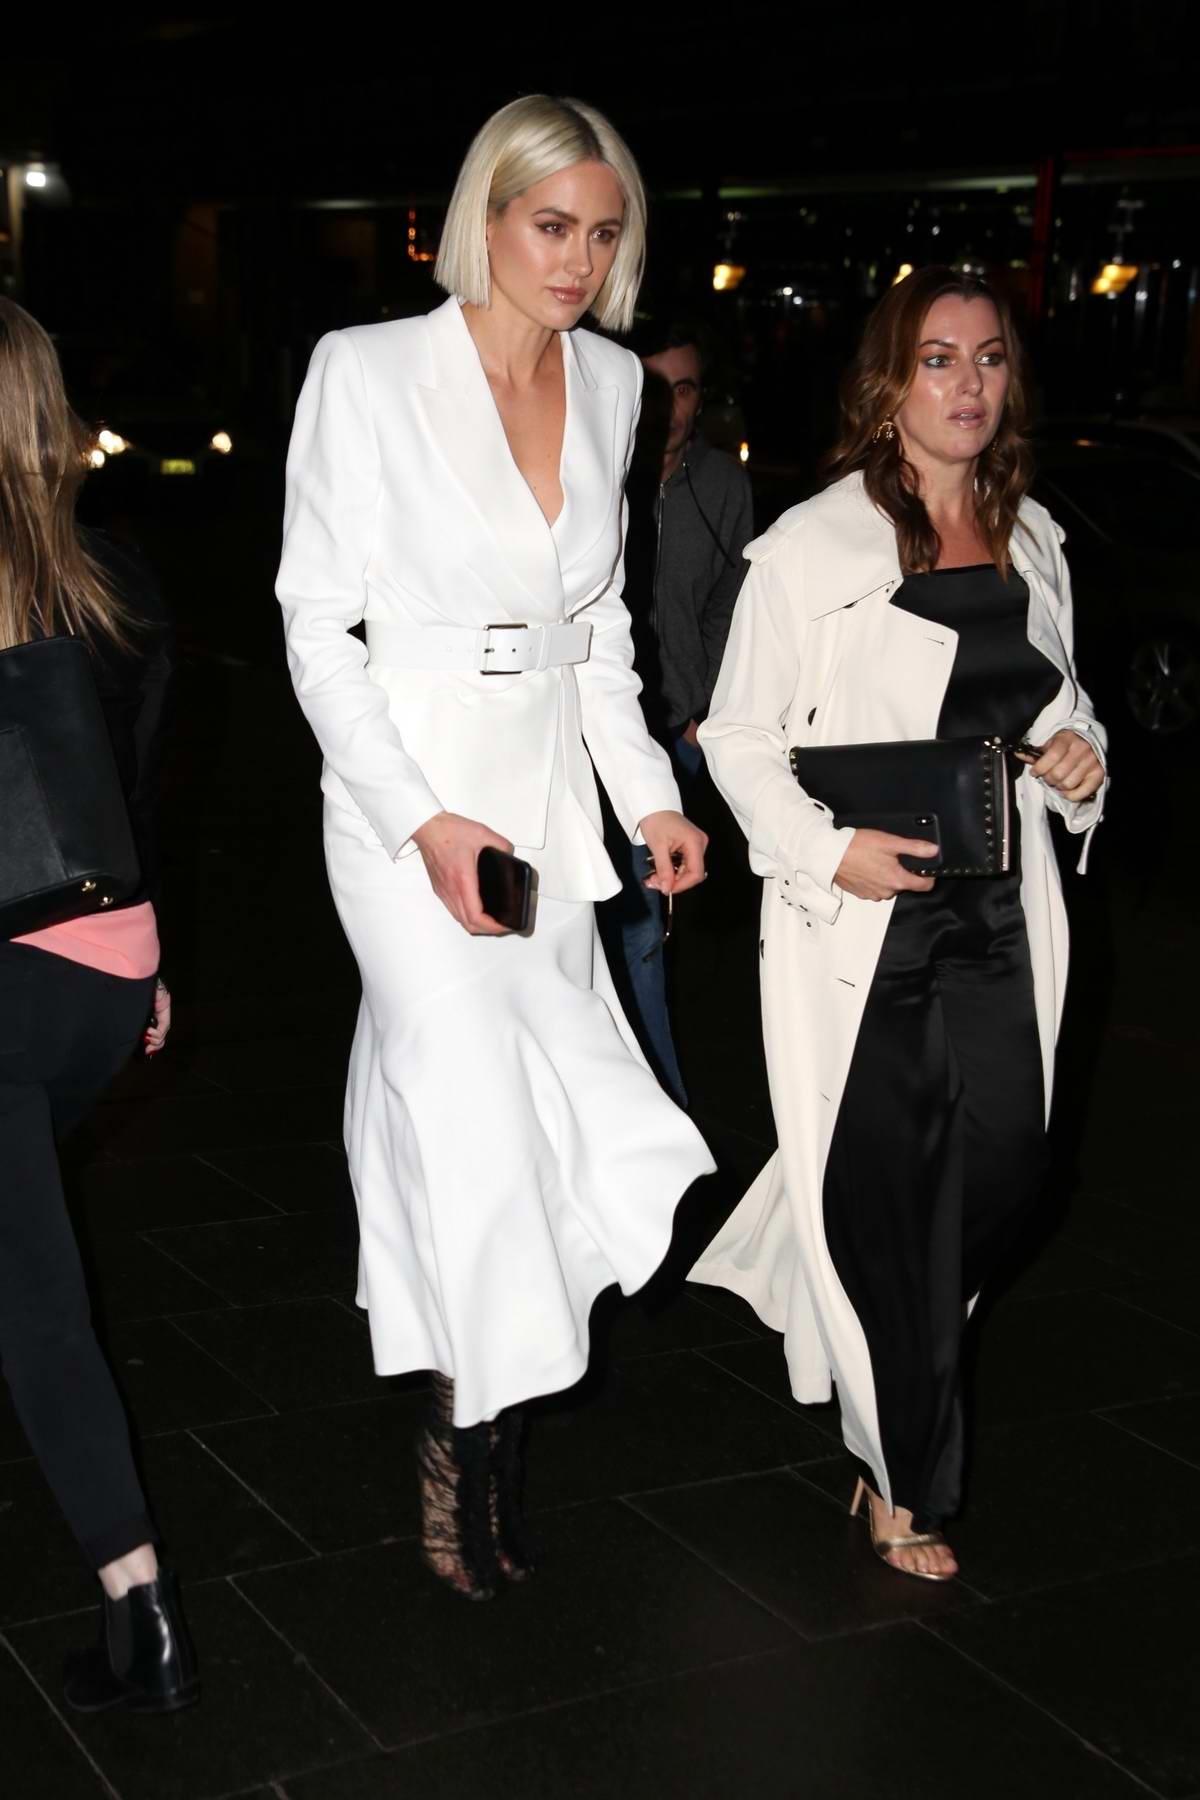 Jesinta Campbell arrives for Myer Runway Show in Sydney, Australia